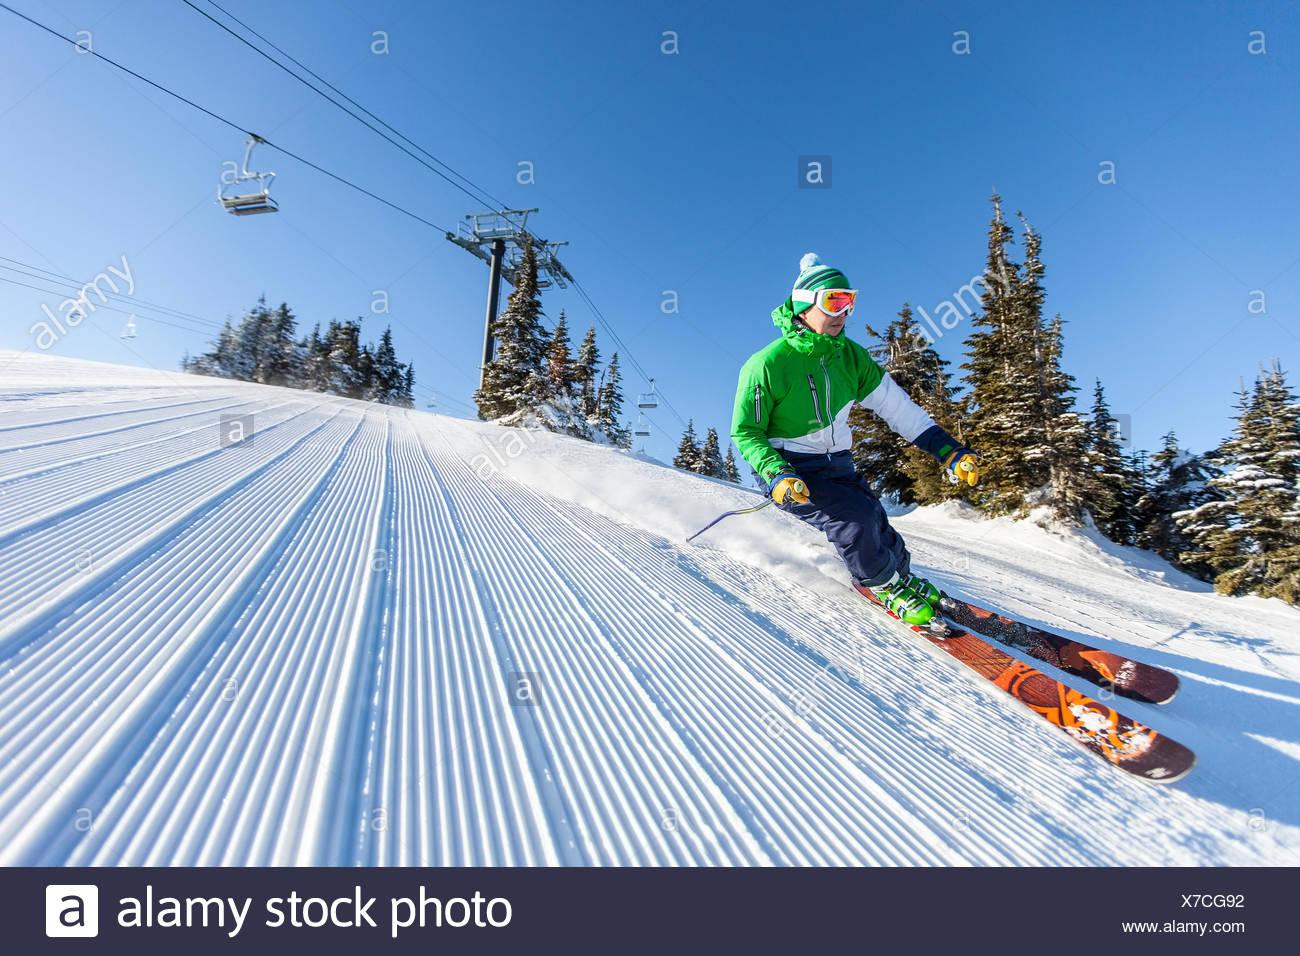 Mature man on ski slope under blue sky - Stock Image